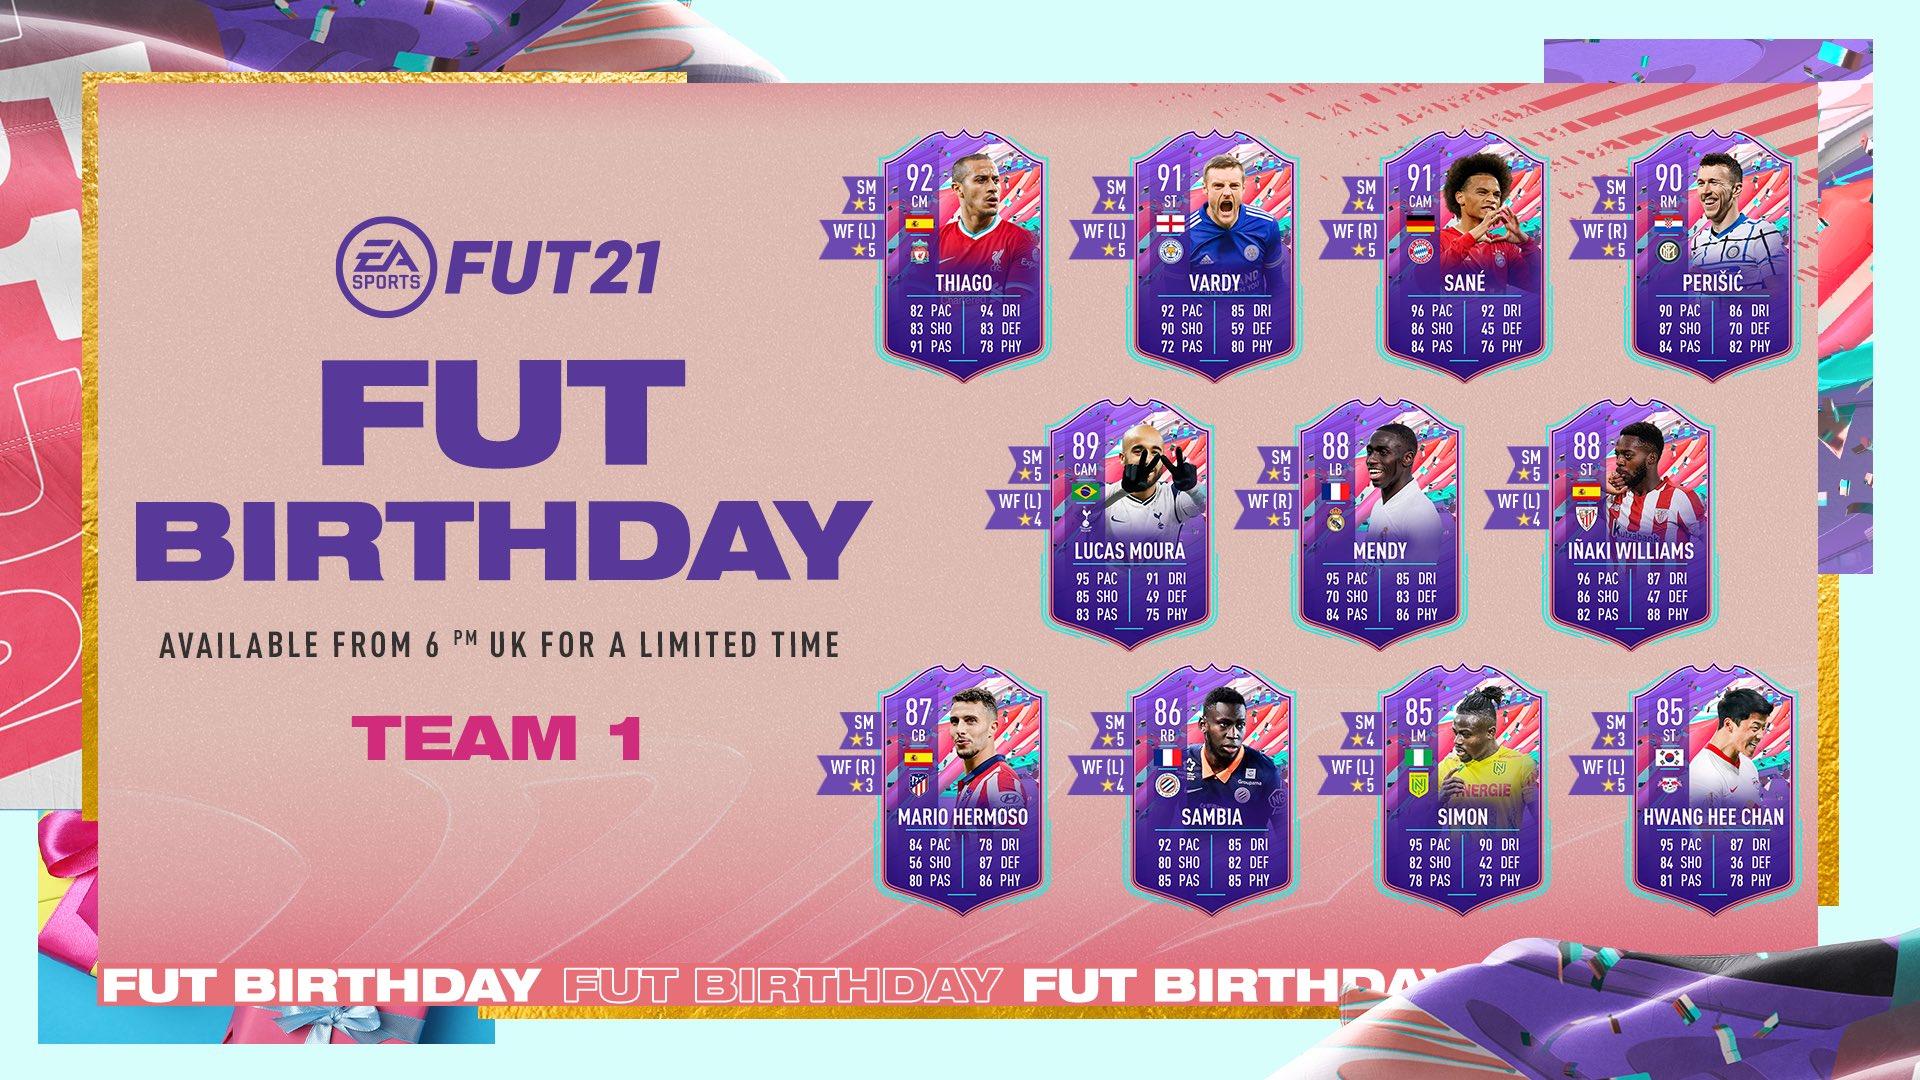 FIFA 21 Ultimate Team FUT Birthday - Compleanno FUT - Team 1